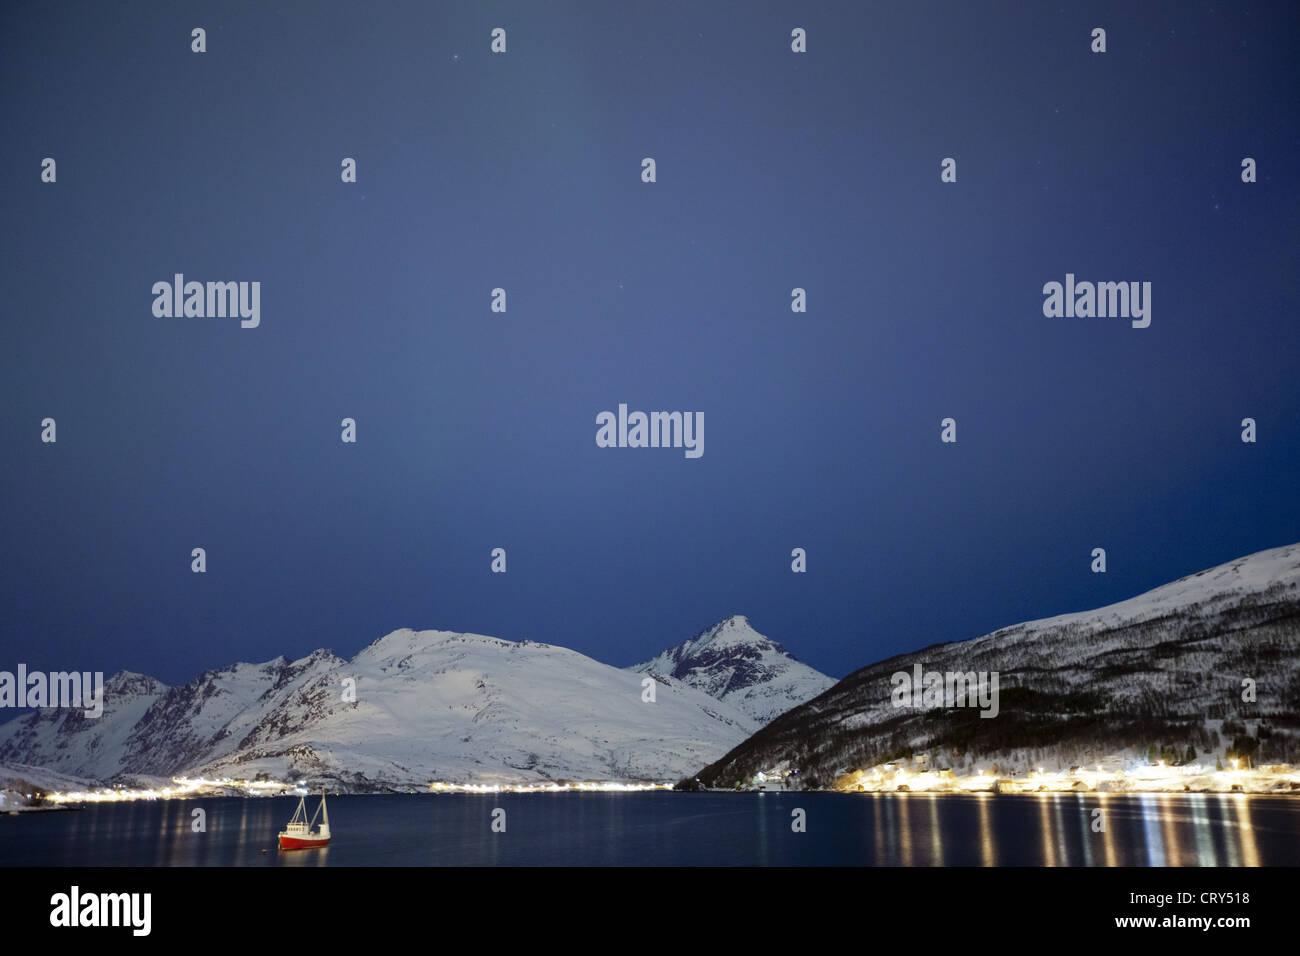 Hamlet on Kvaloya Island near Tromso in Arctic Circle Northern Norway Stock Photo